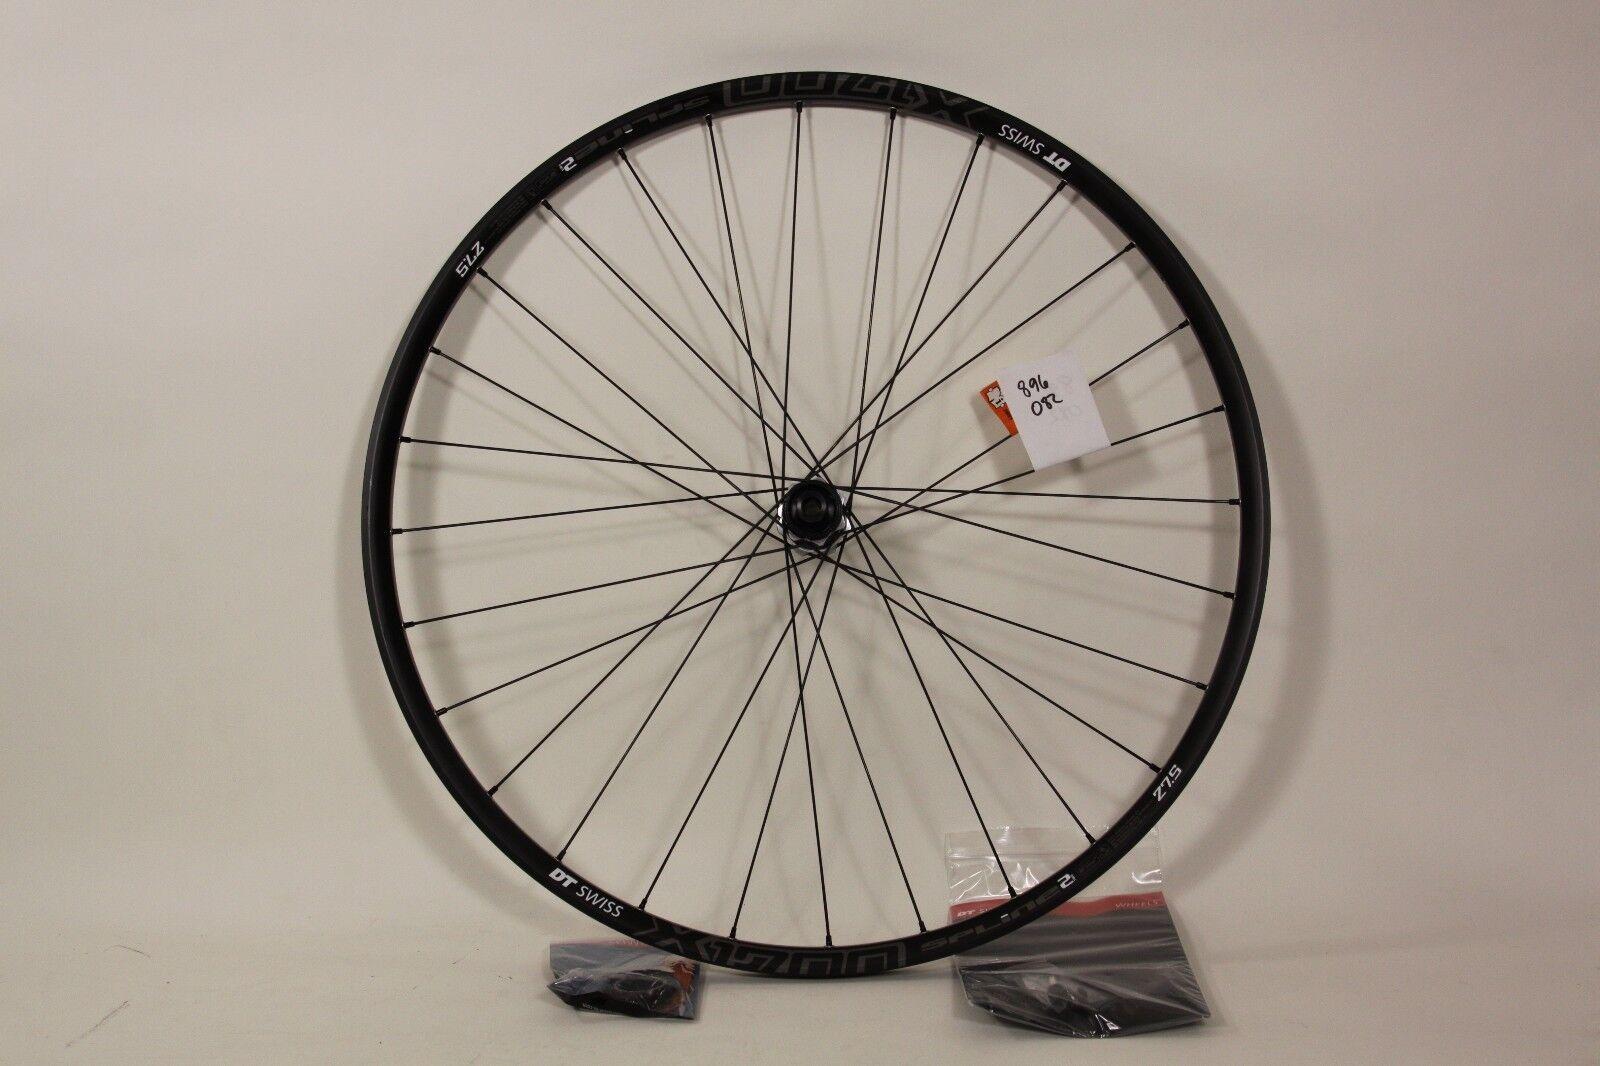 DT Swiss 27.5 Rear Wheel X1700 Spline2 XD Driver  12x148mm Thru Axle 28h CL  082